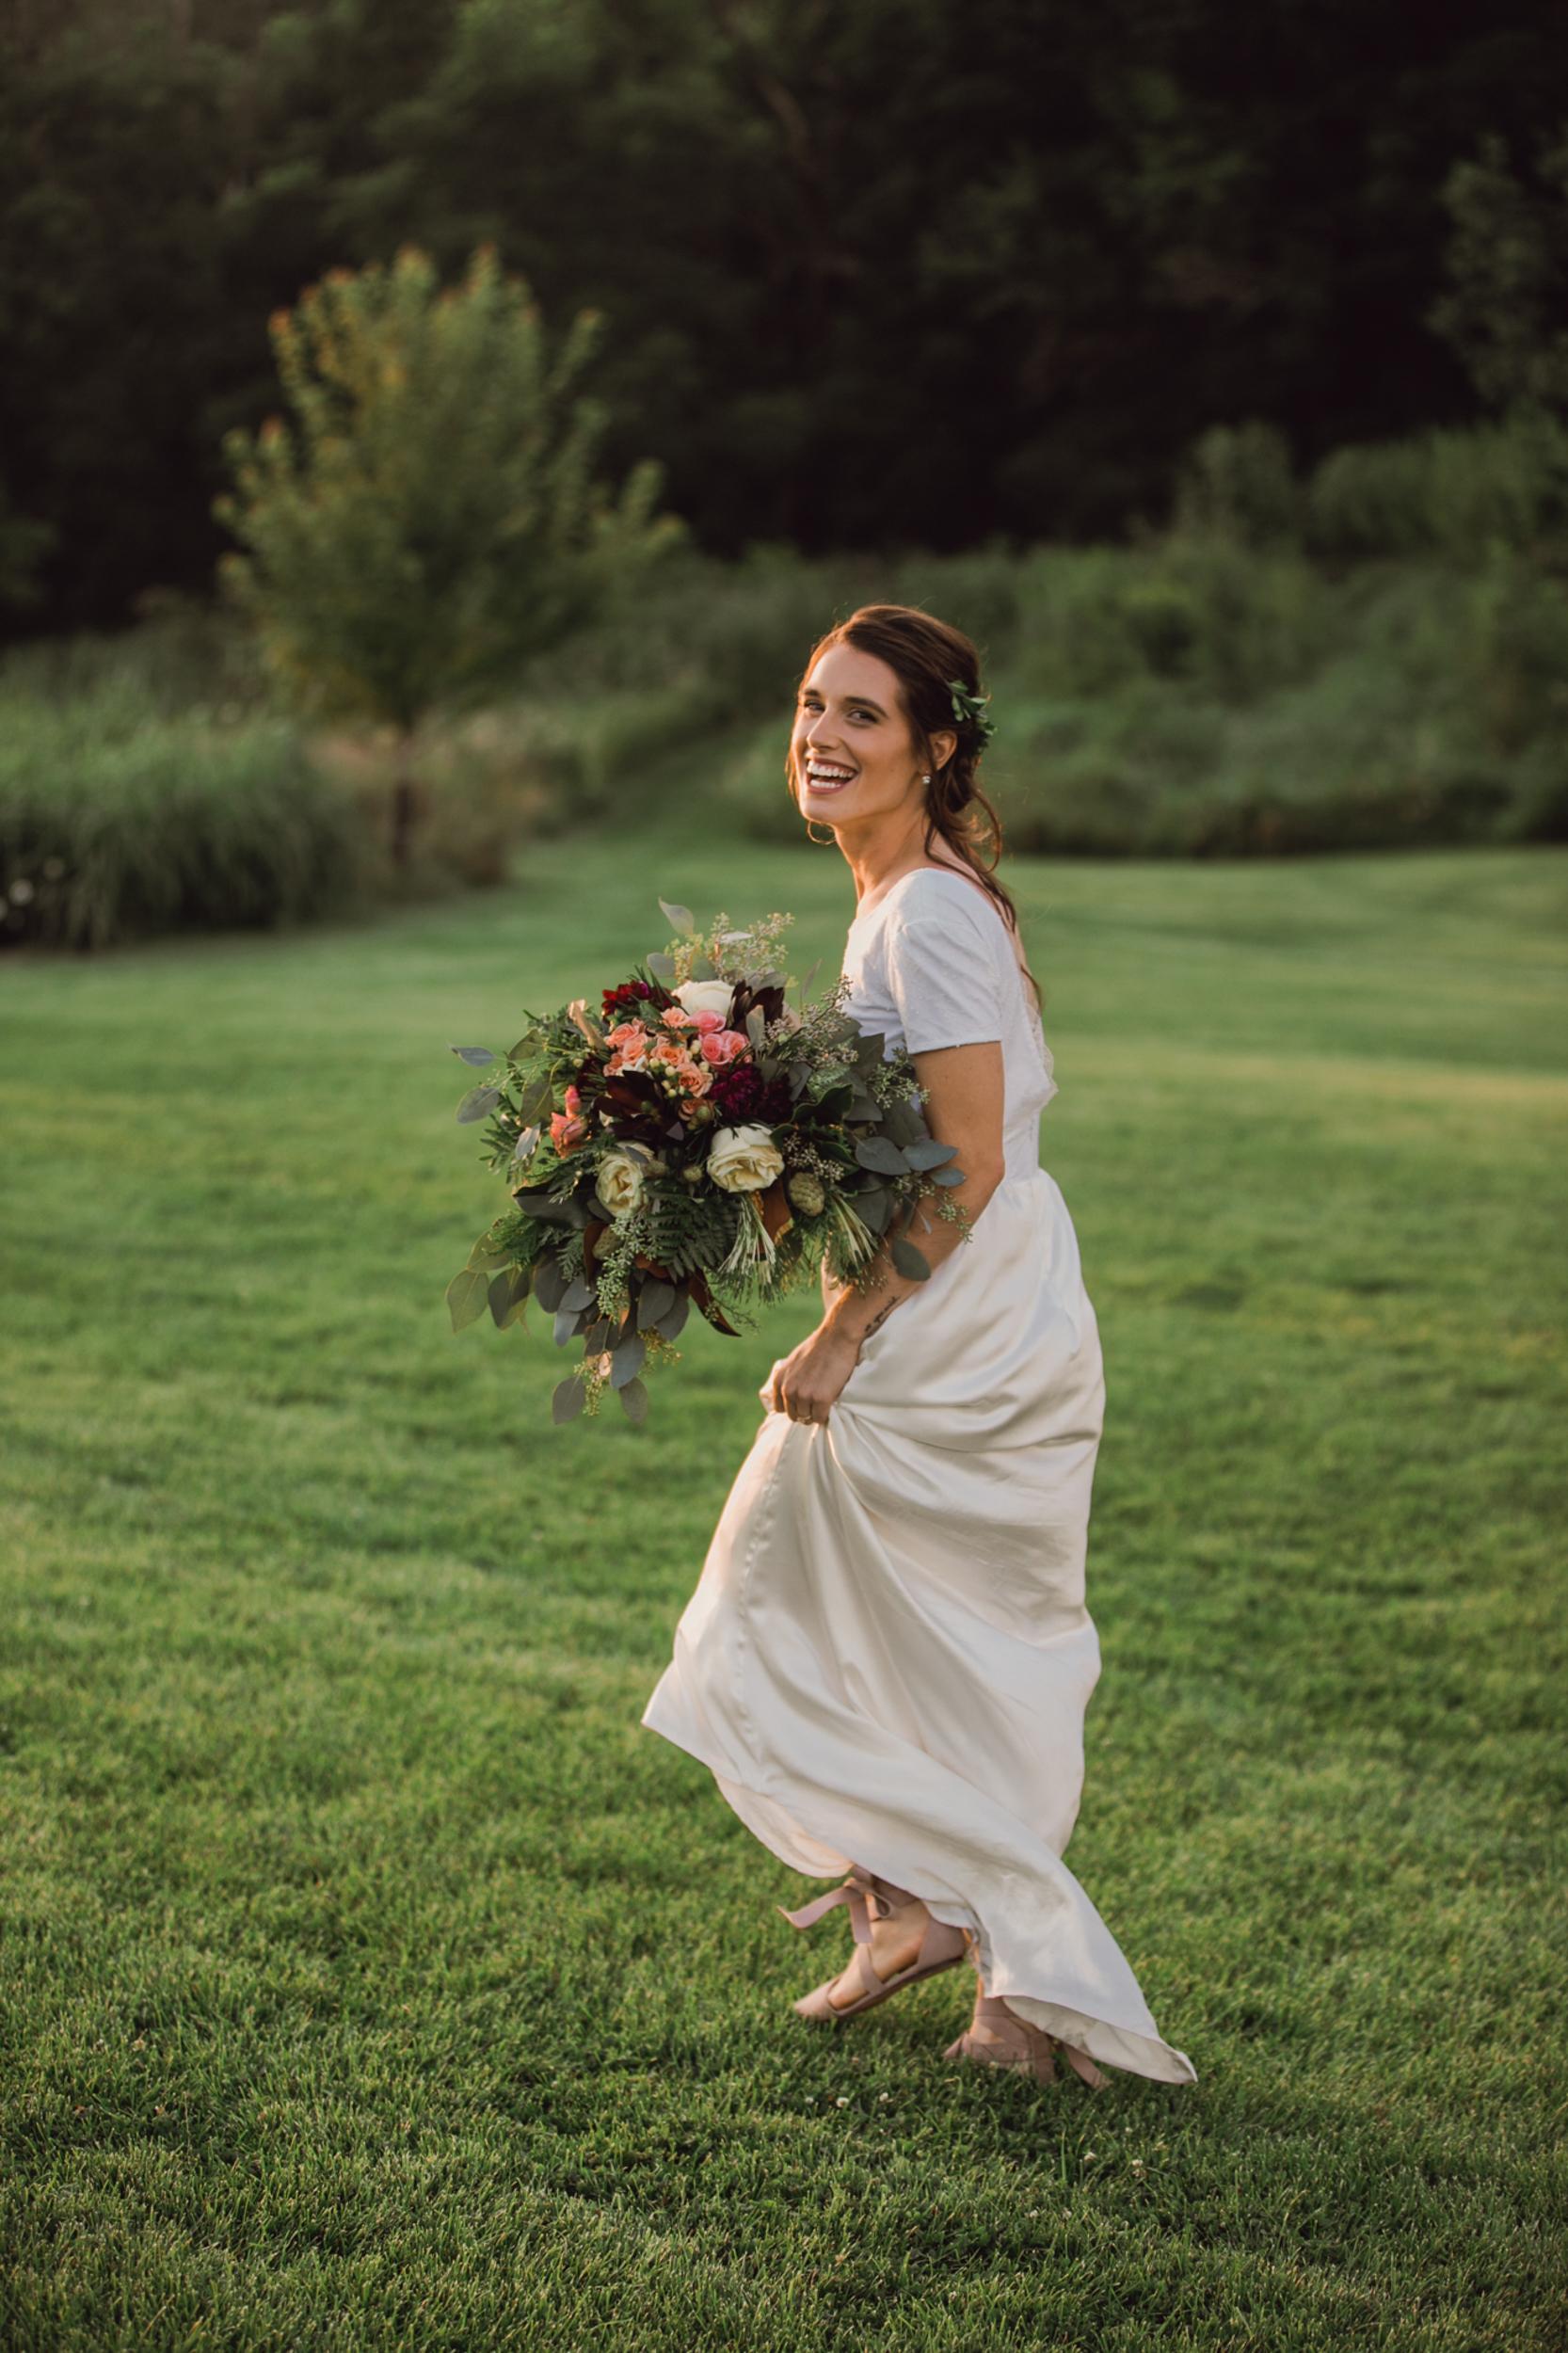 wedding-photography-dark-moody-rustic-details-6.jpg